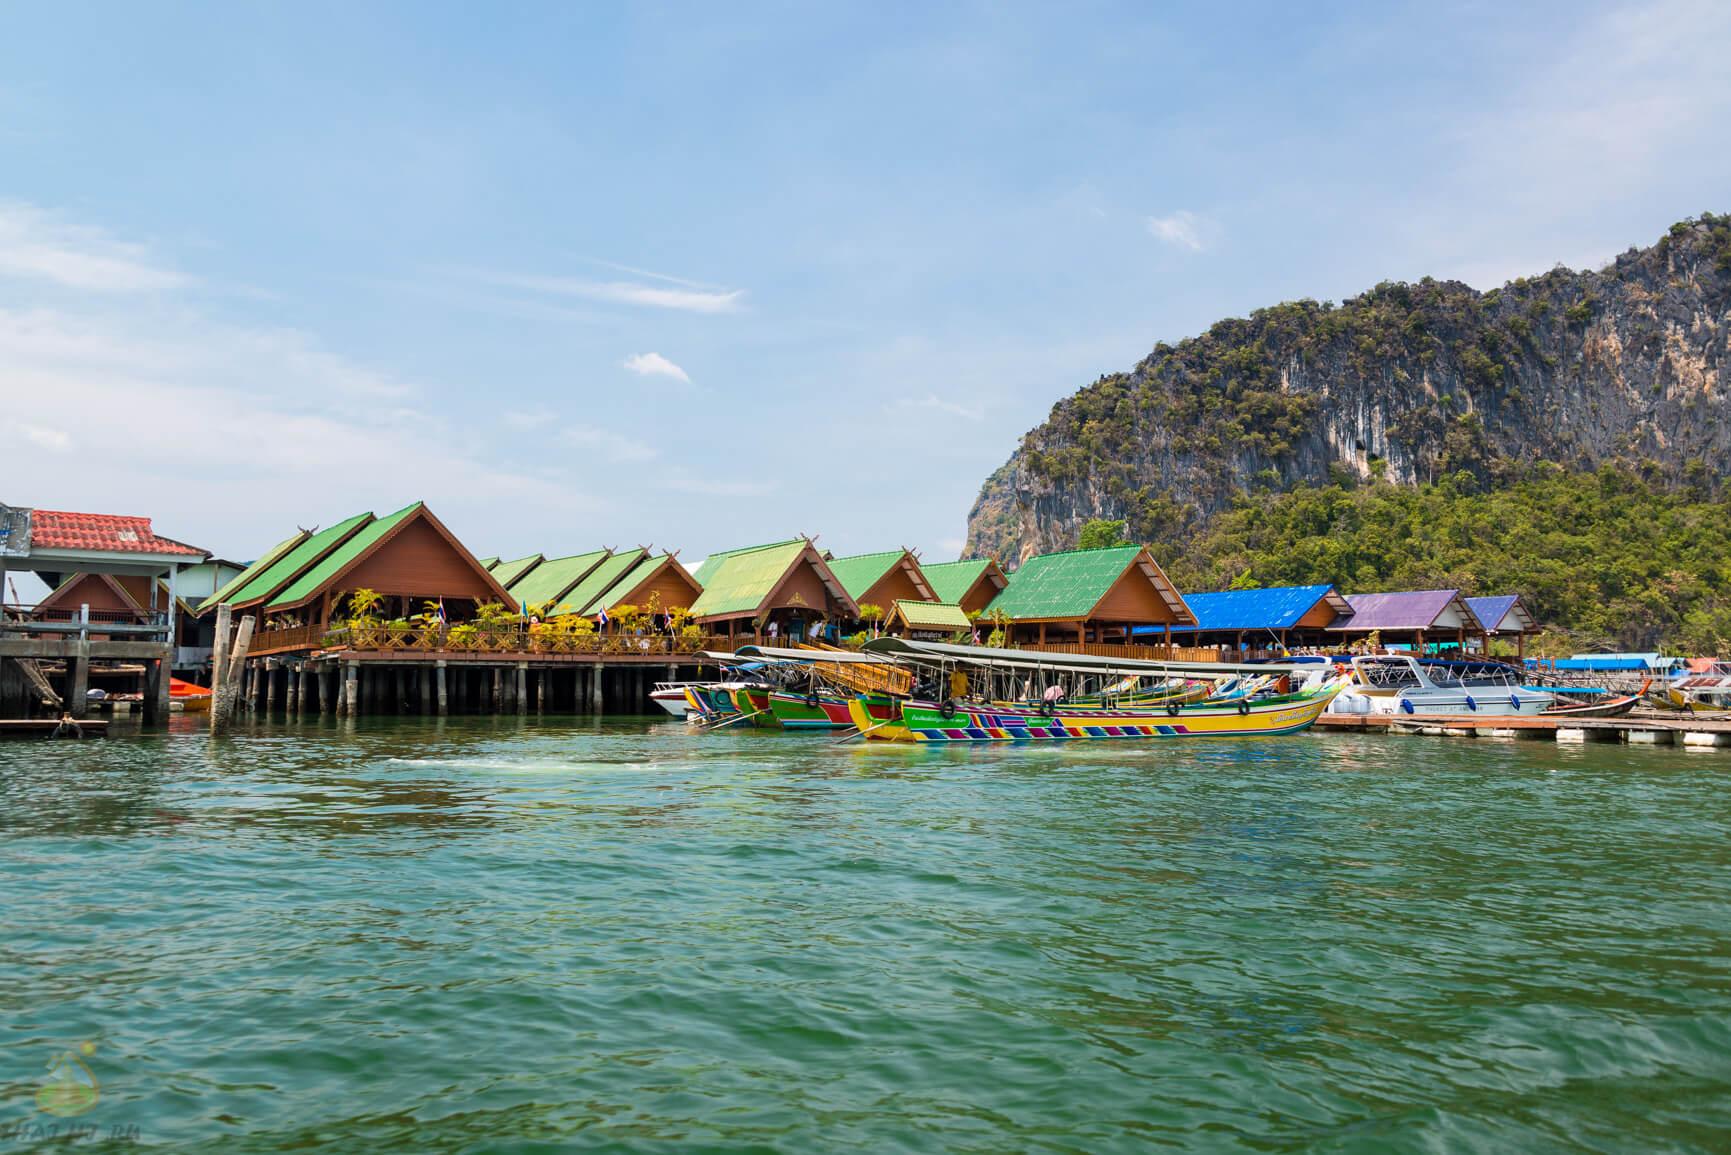 Плавучая Деревня (Floating Village) в Тайланде